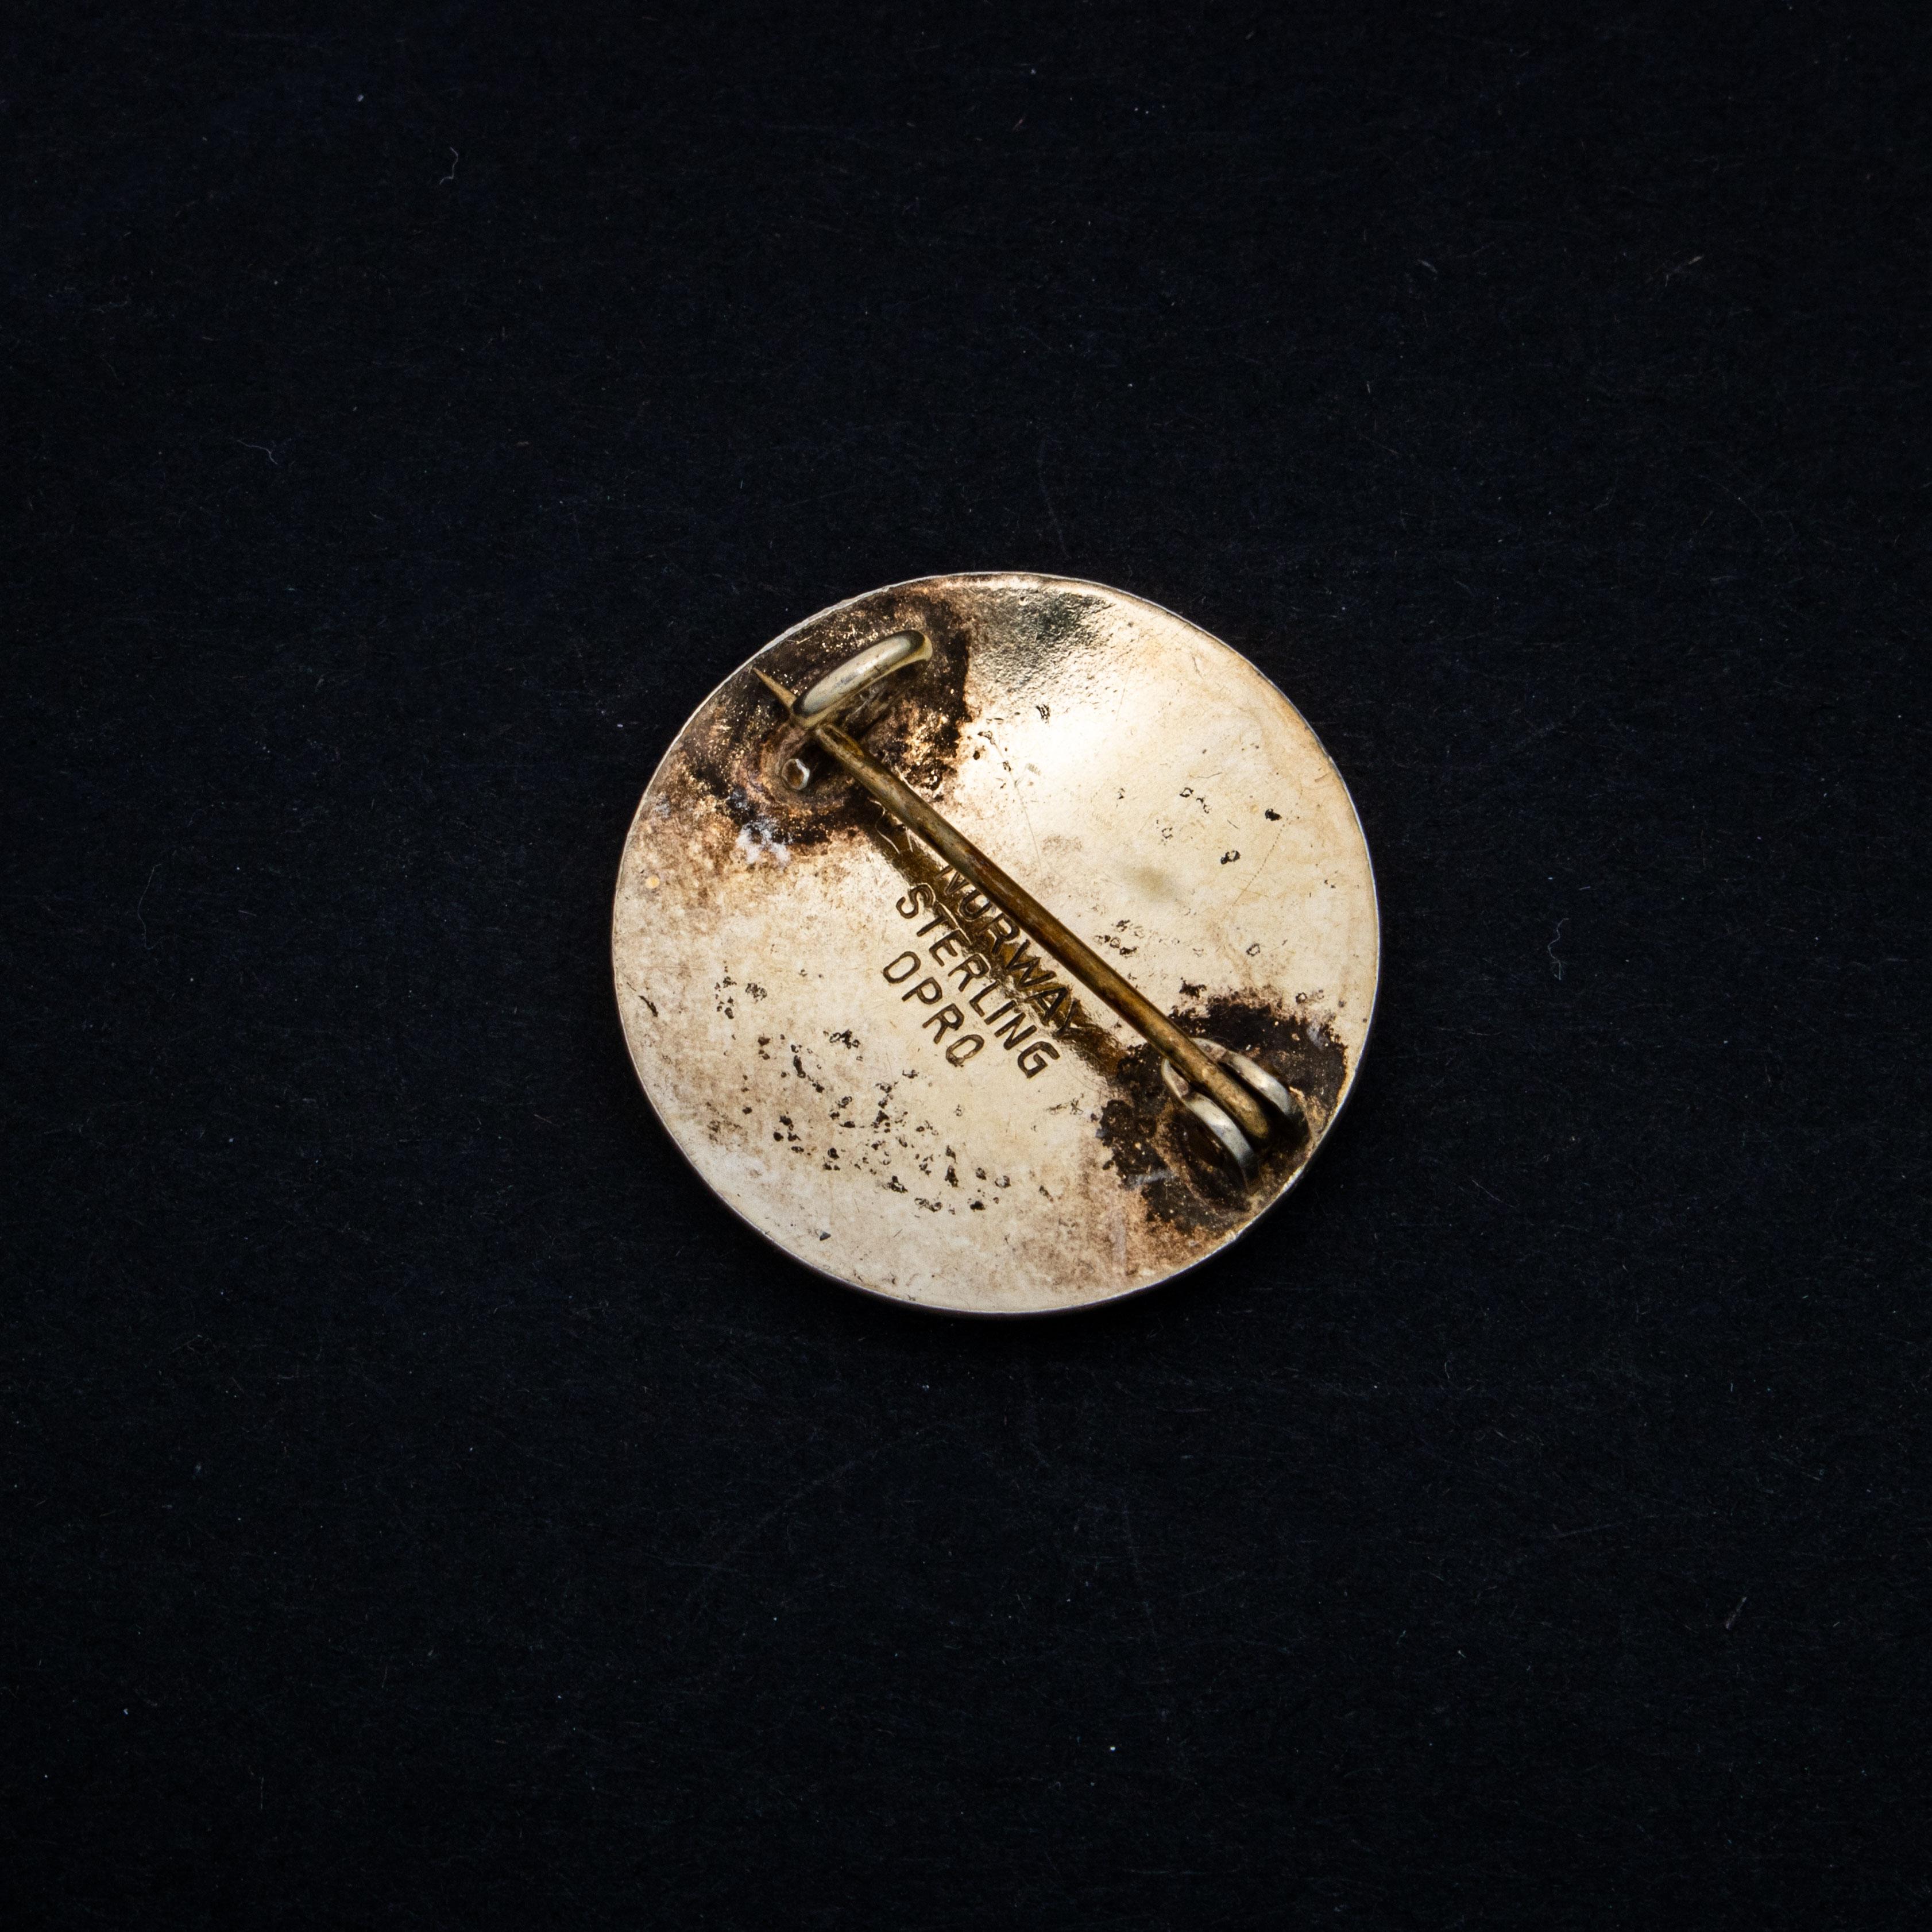 Opro brosje, sterling sølv, emalje